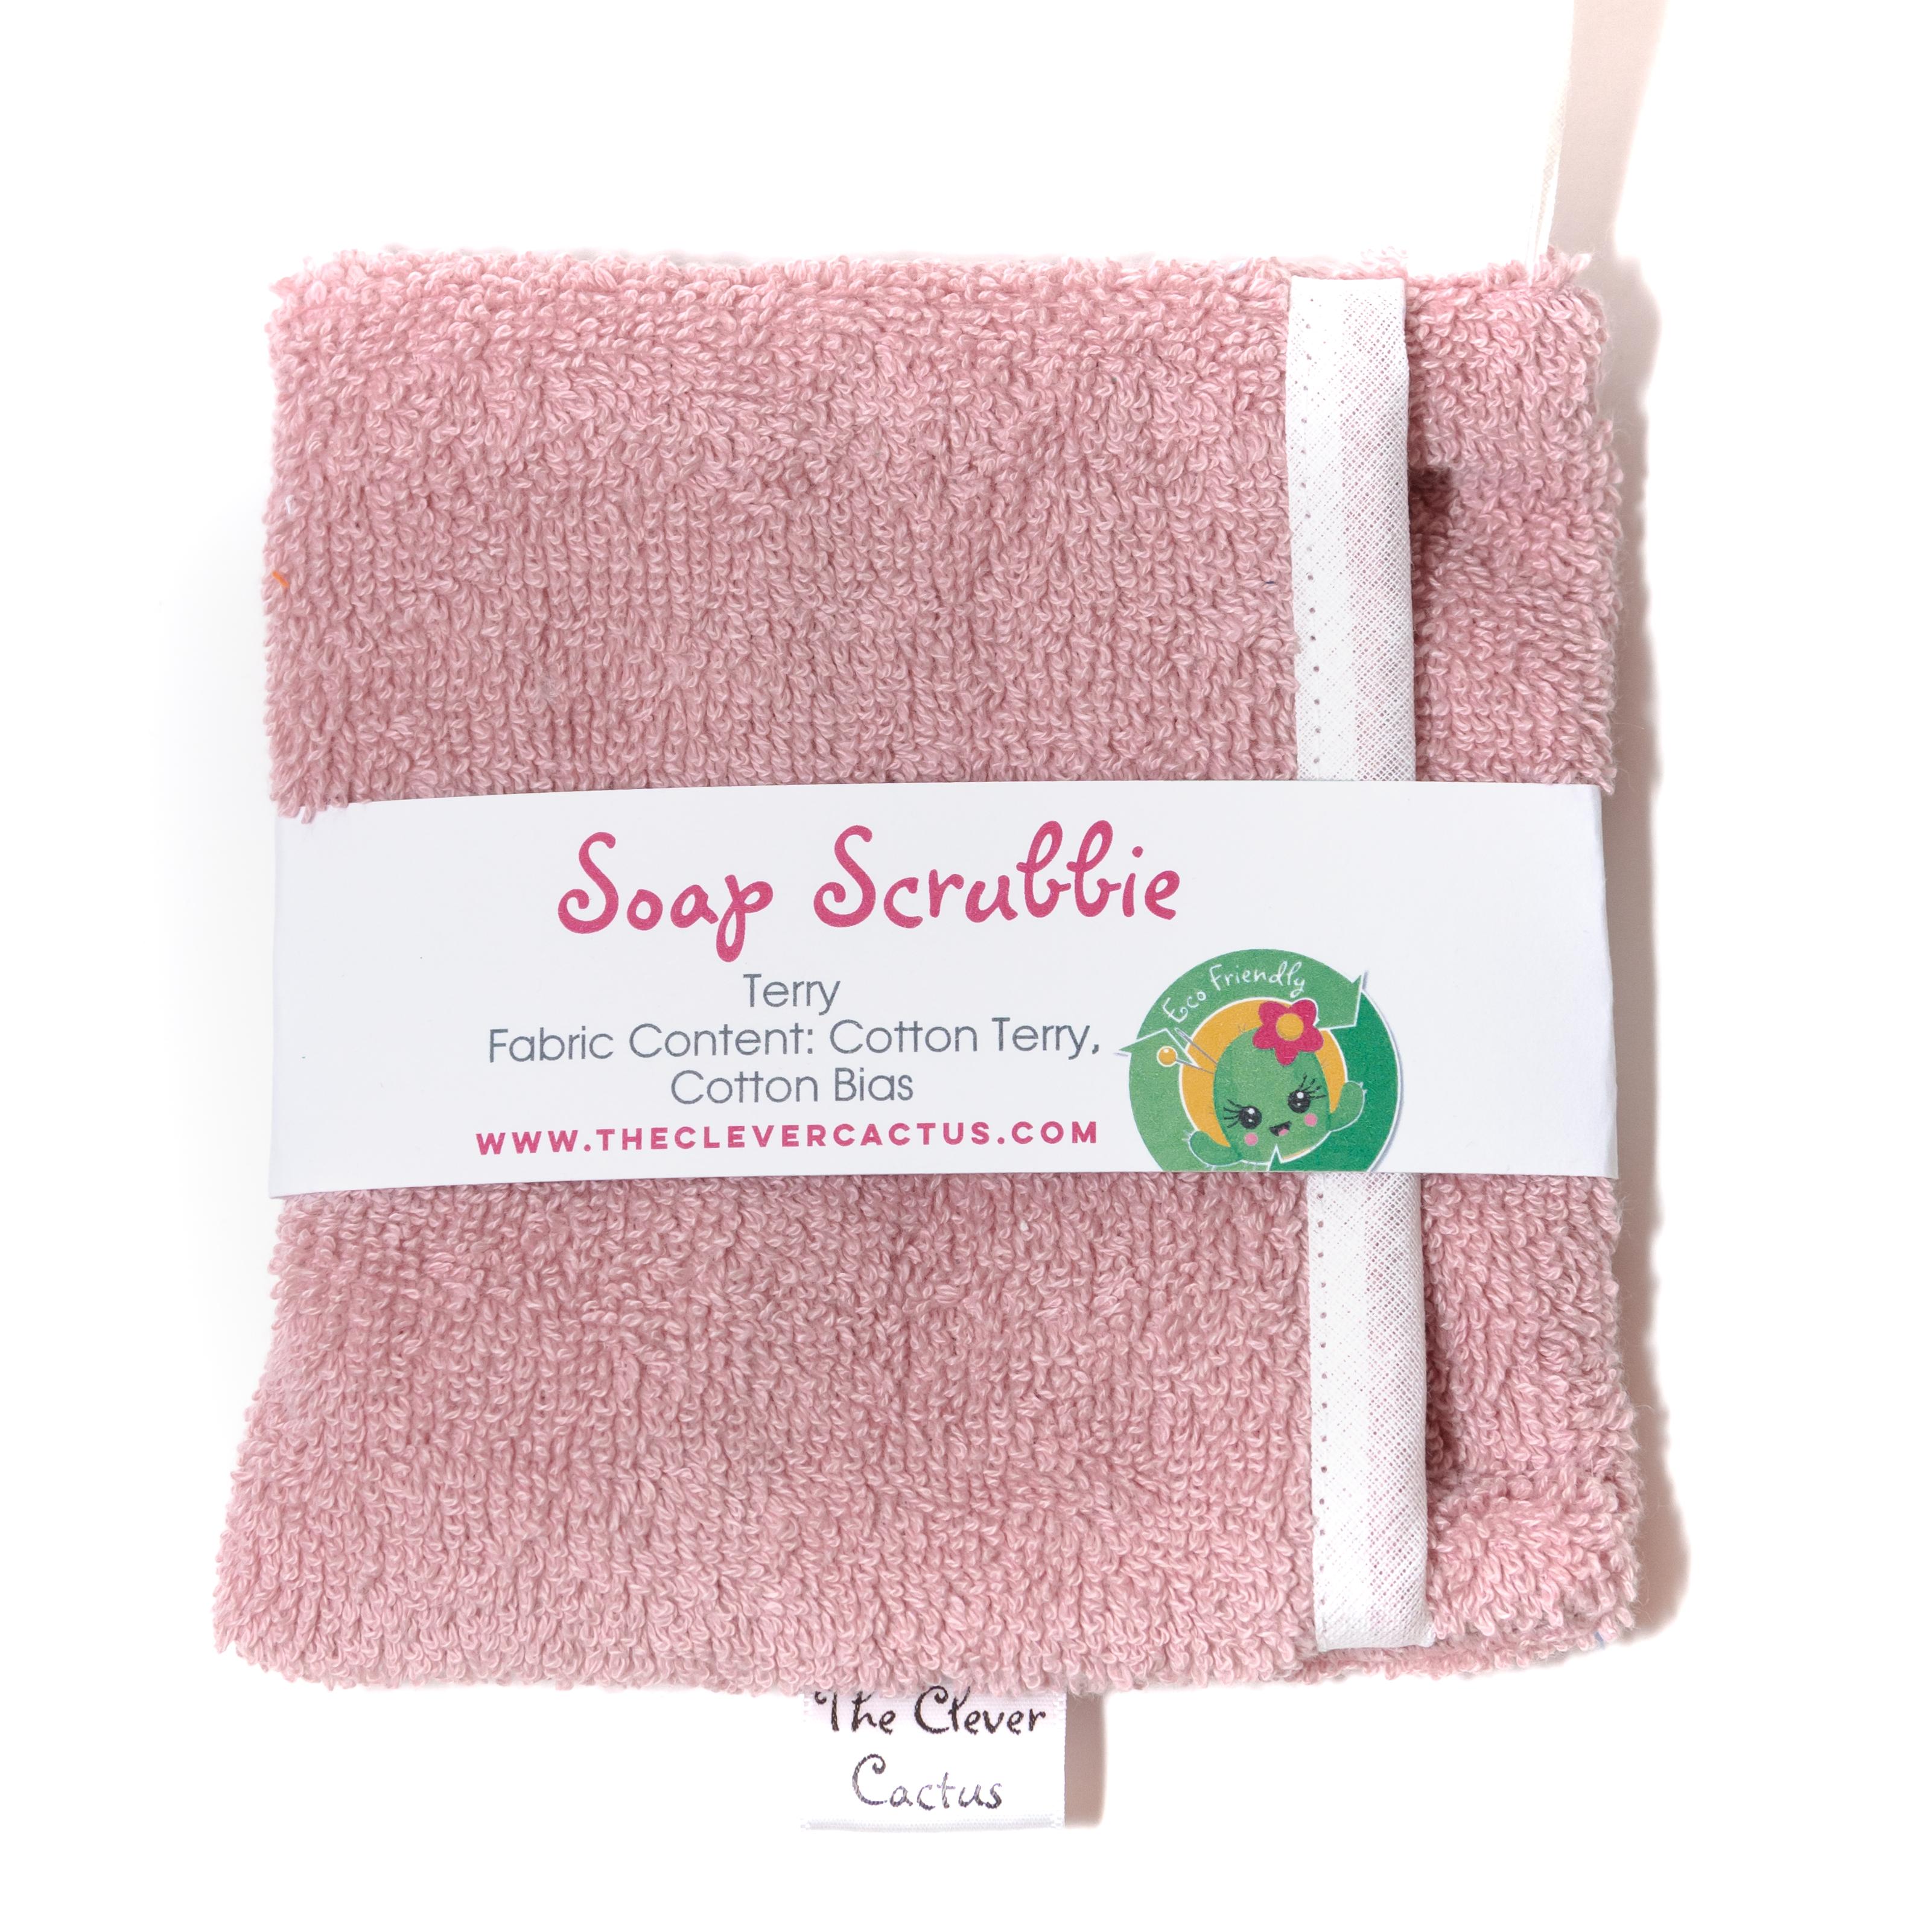 Soap Scrubbie | The Clever Cactus